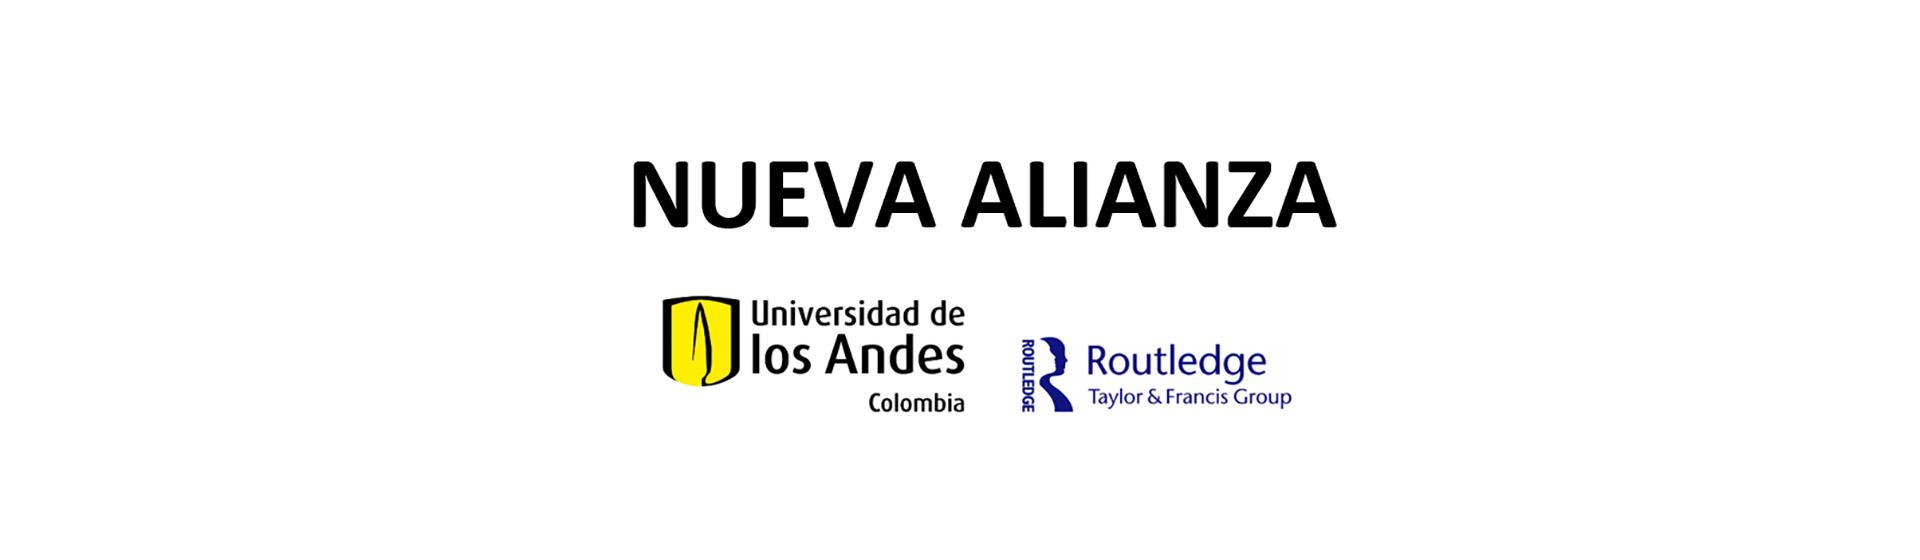 Convenio Uniandes - Taylor & Francis / Routledge